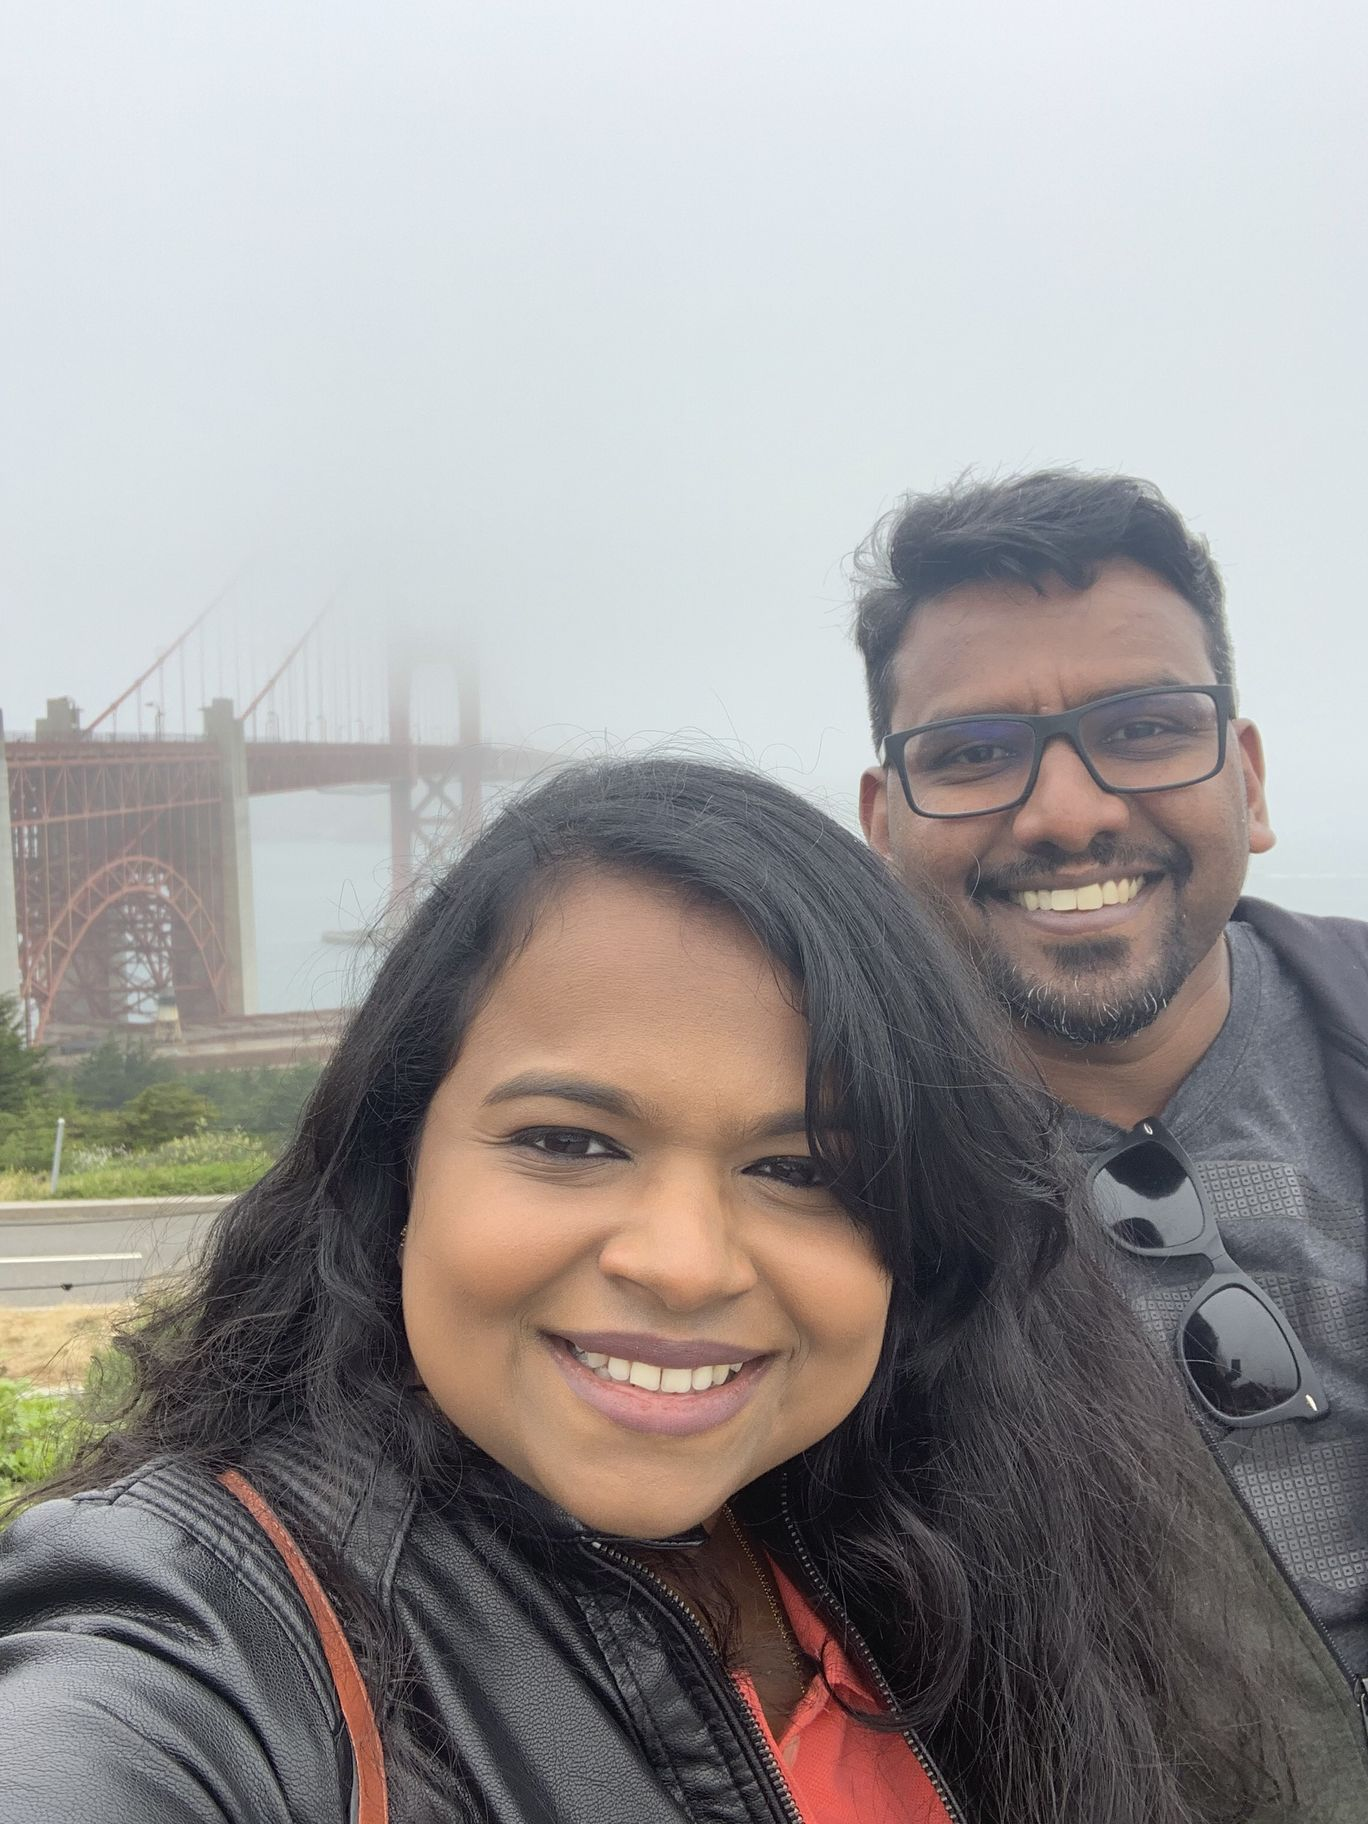 Photo of Golden Gate Park By Sherinscorner